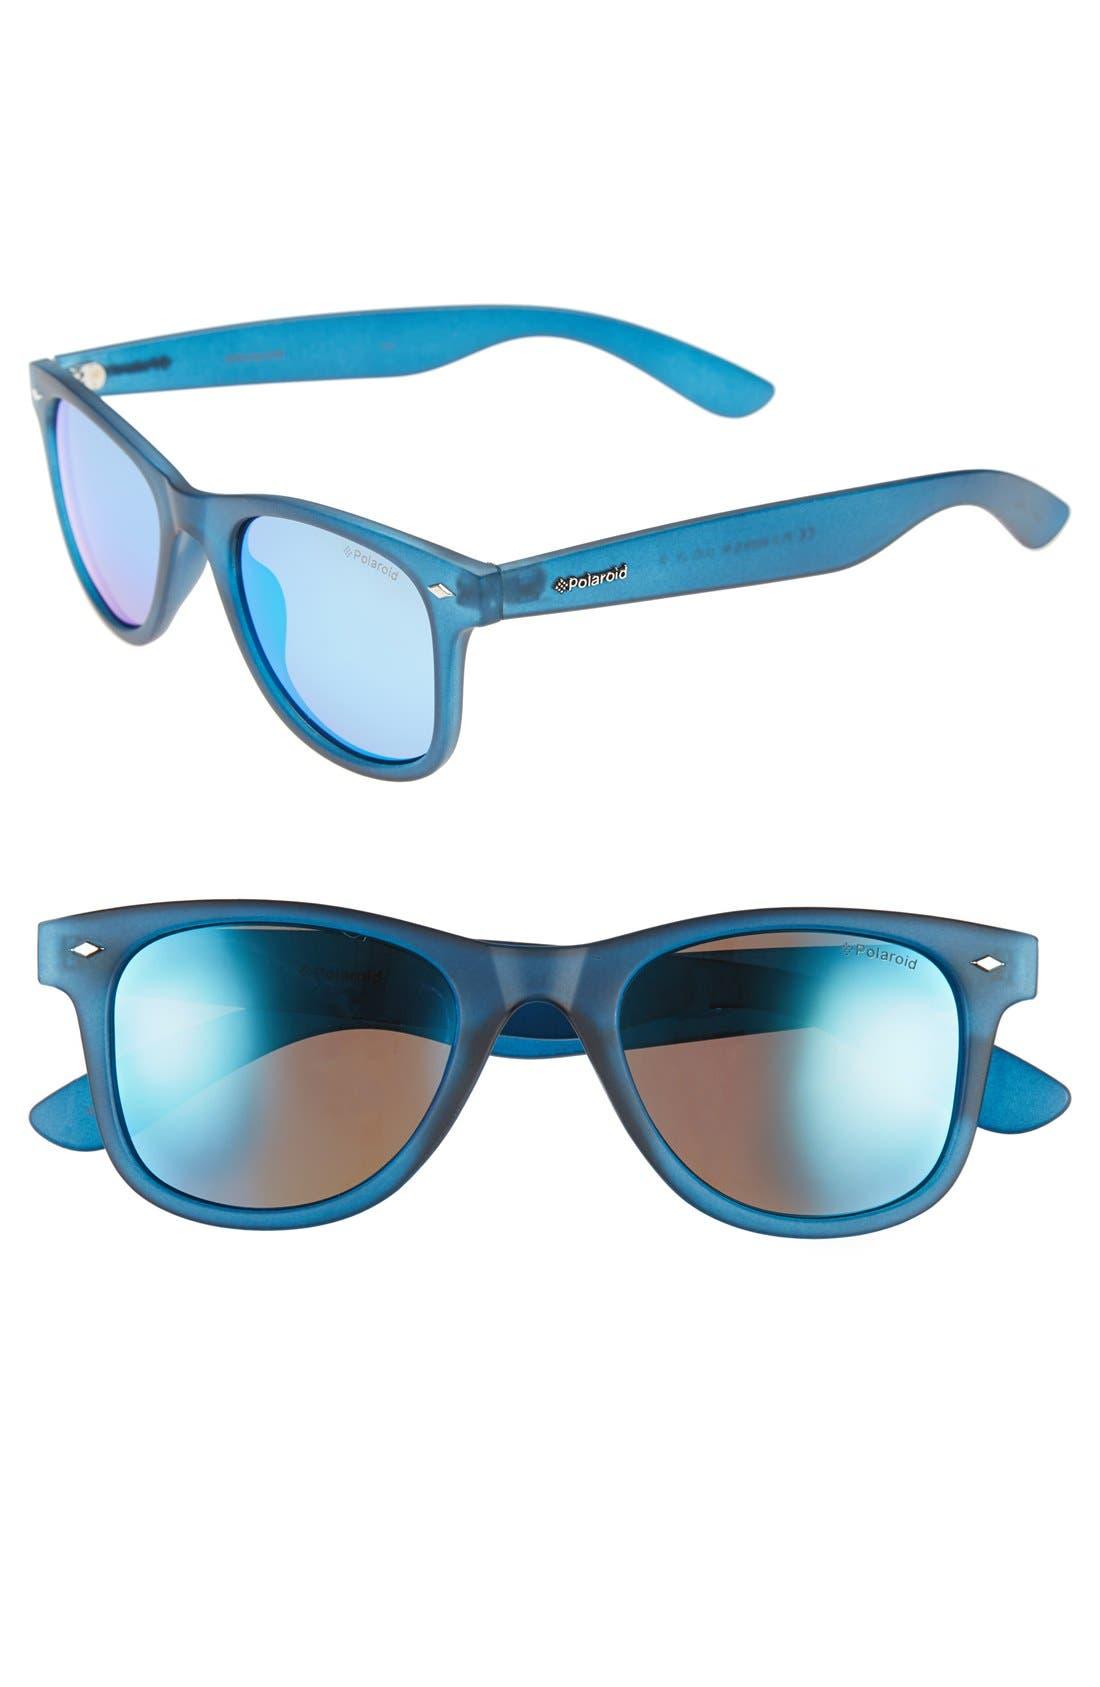 '6009SM' 50mm Polarized Retro Sunglasses,                             Main thumbnail 2, color,